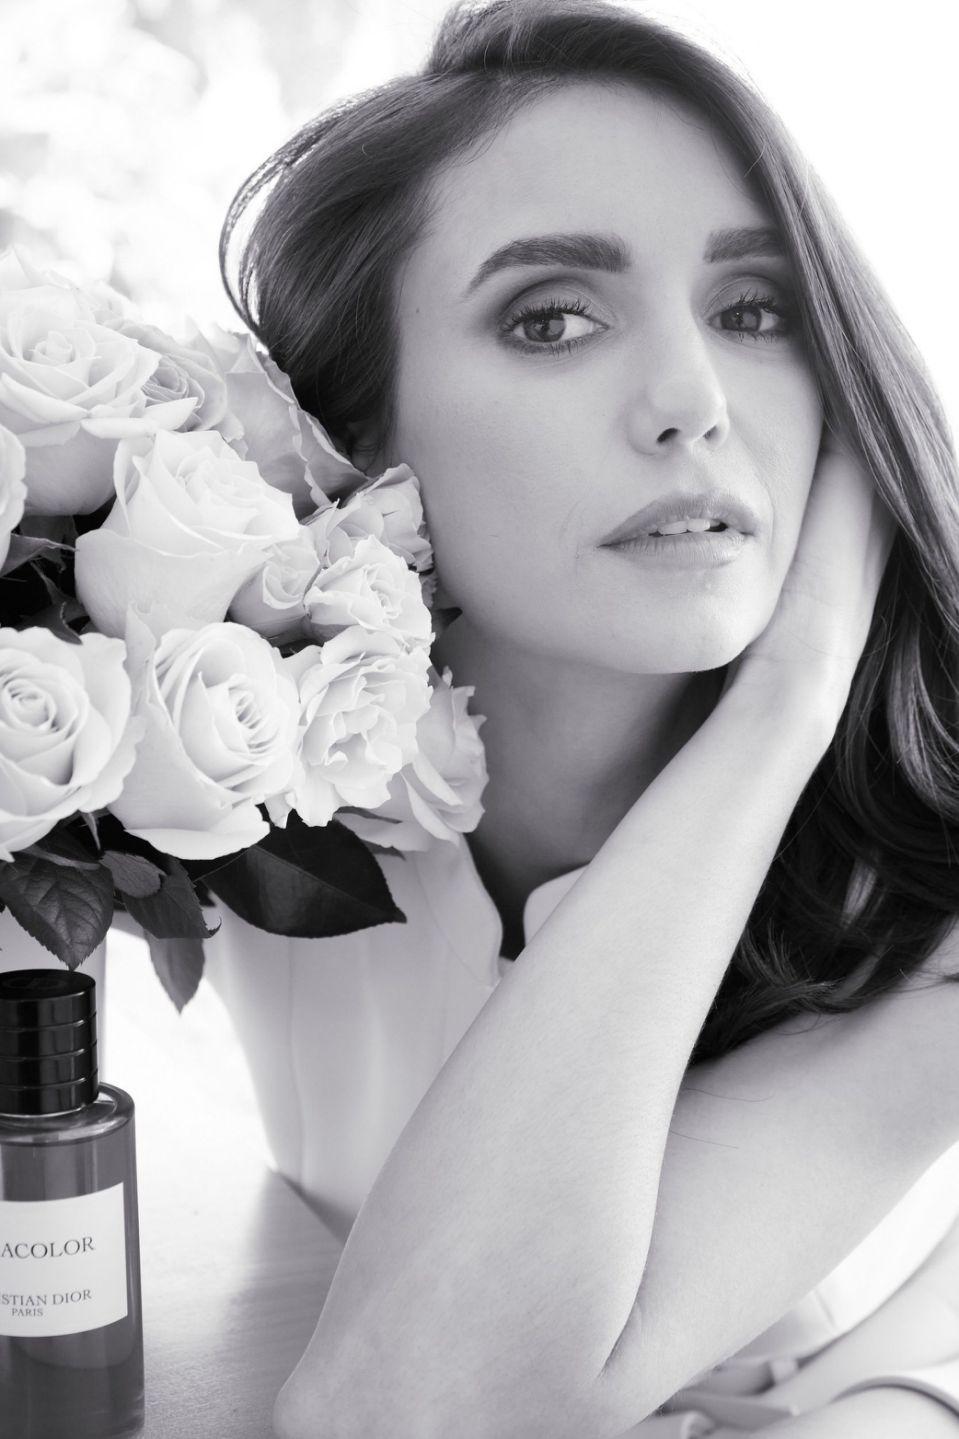 Актриса Нина Добрев стала лицом нового аромата Maison Christian Dior (ФОТО) - фото №1